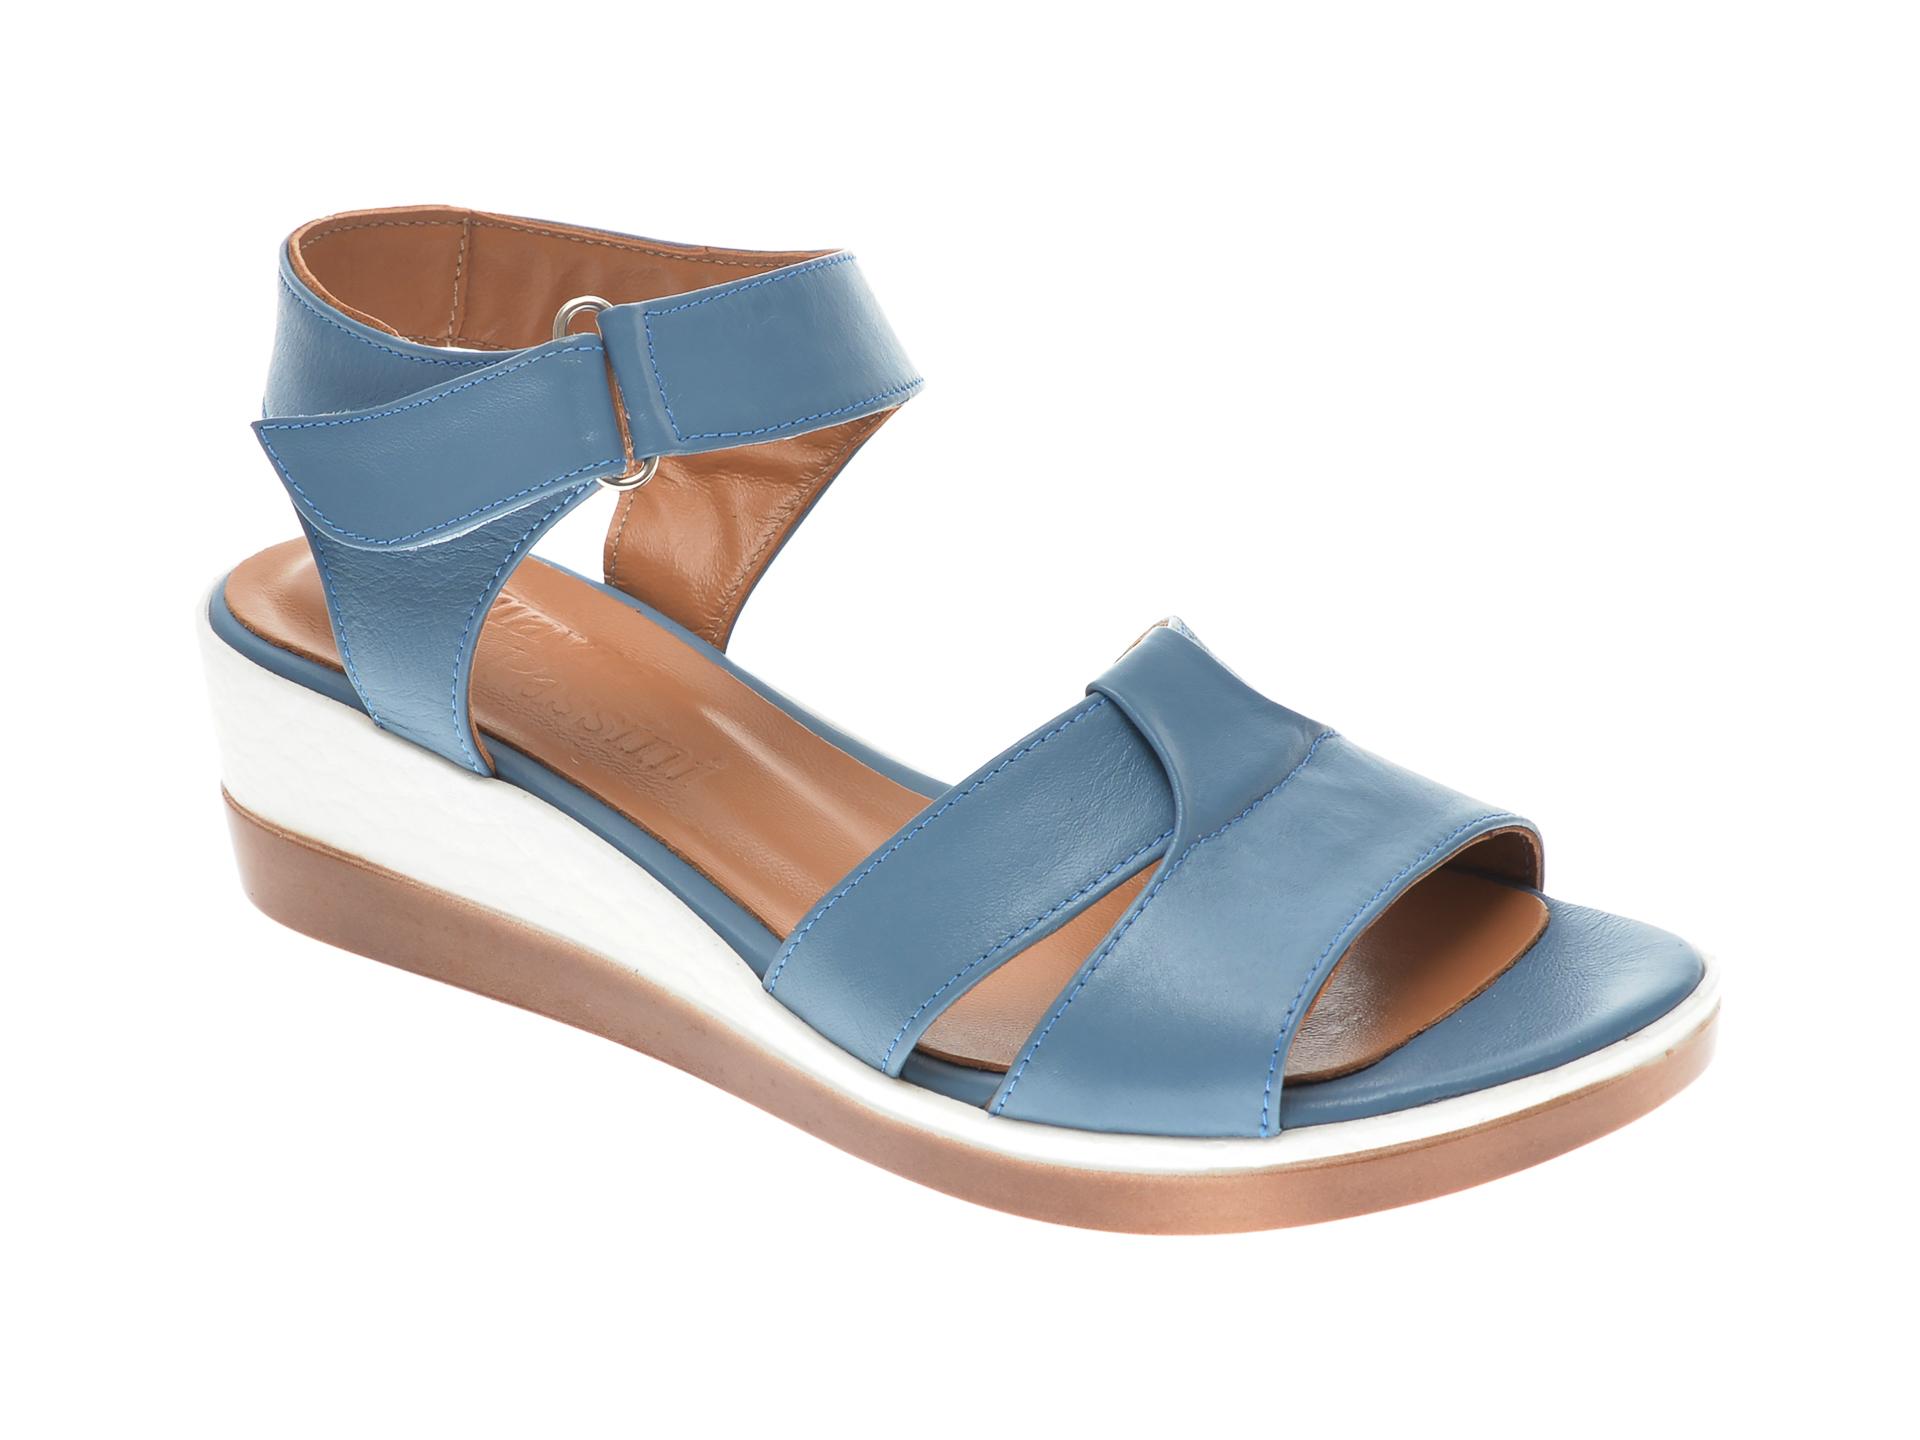 Sandale FLAVIA PASSINI albastre, 20705, din piele naturala New